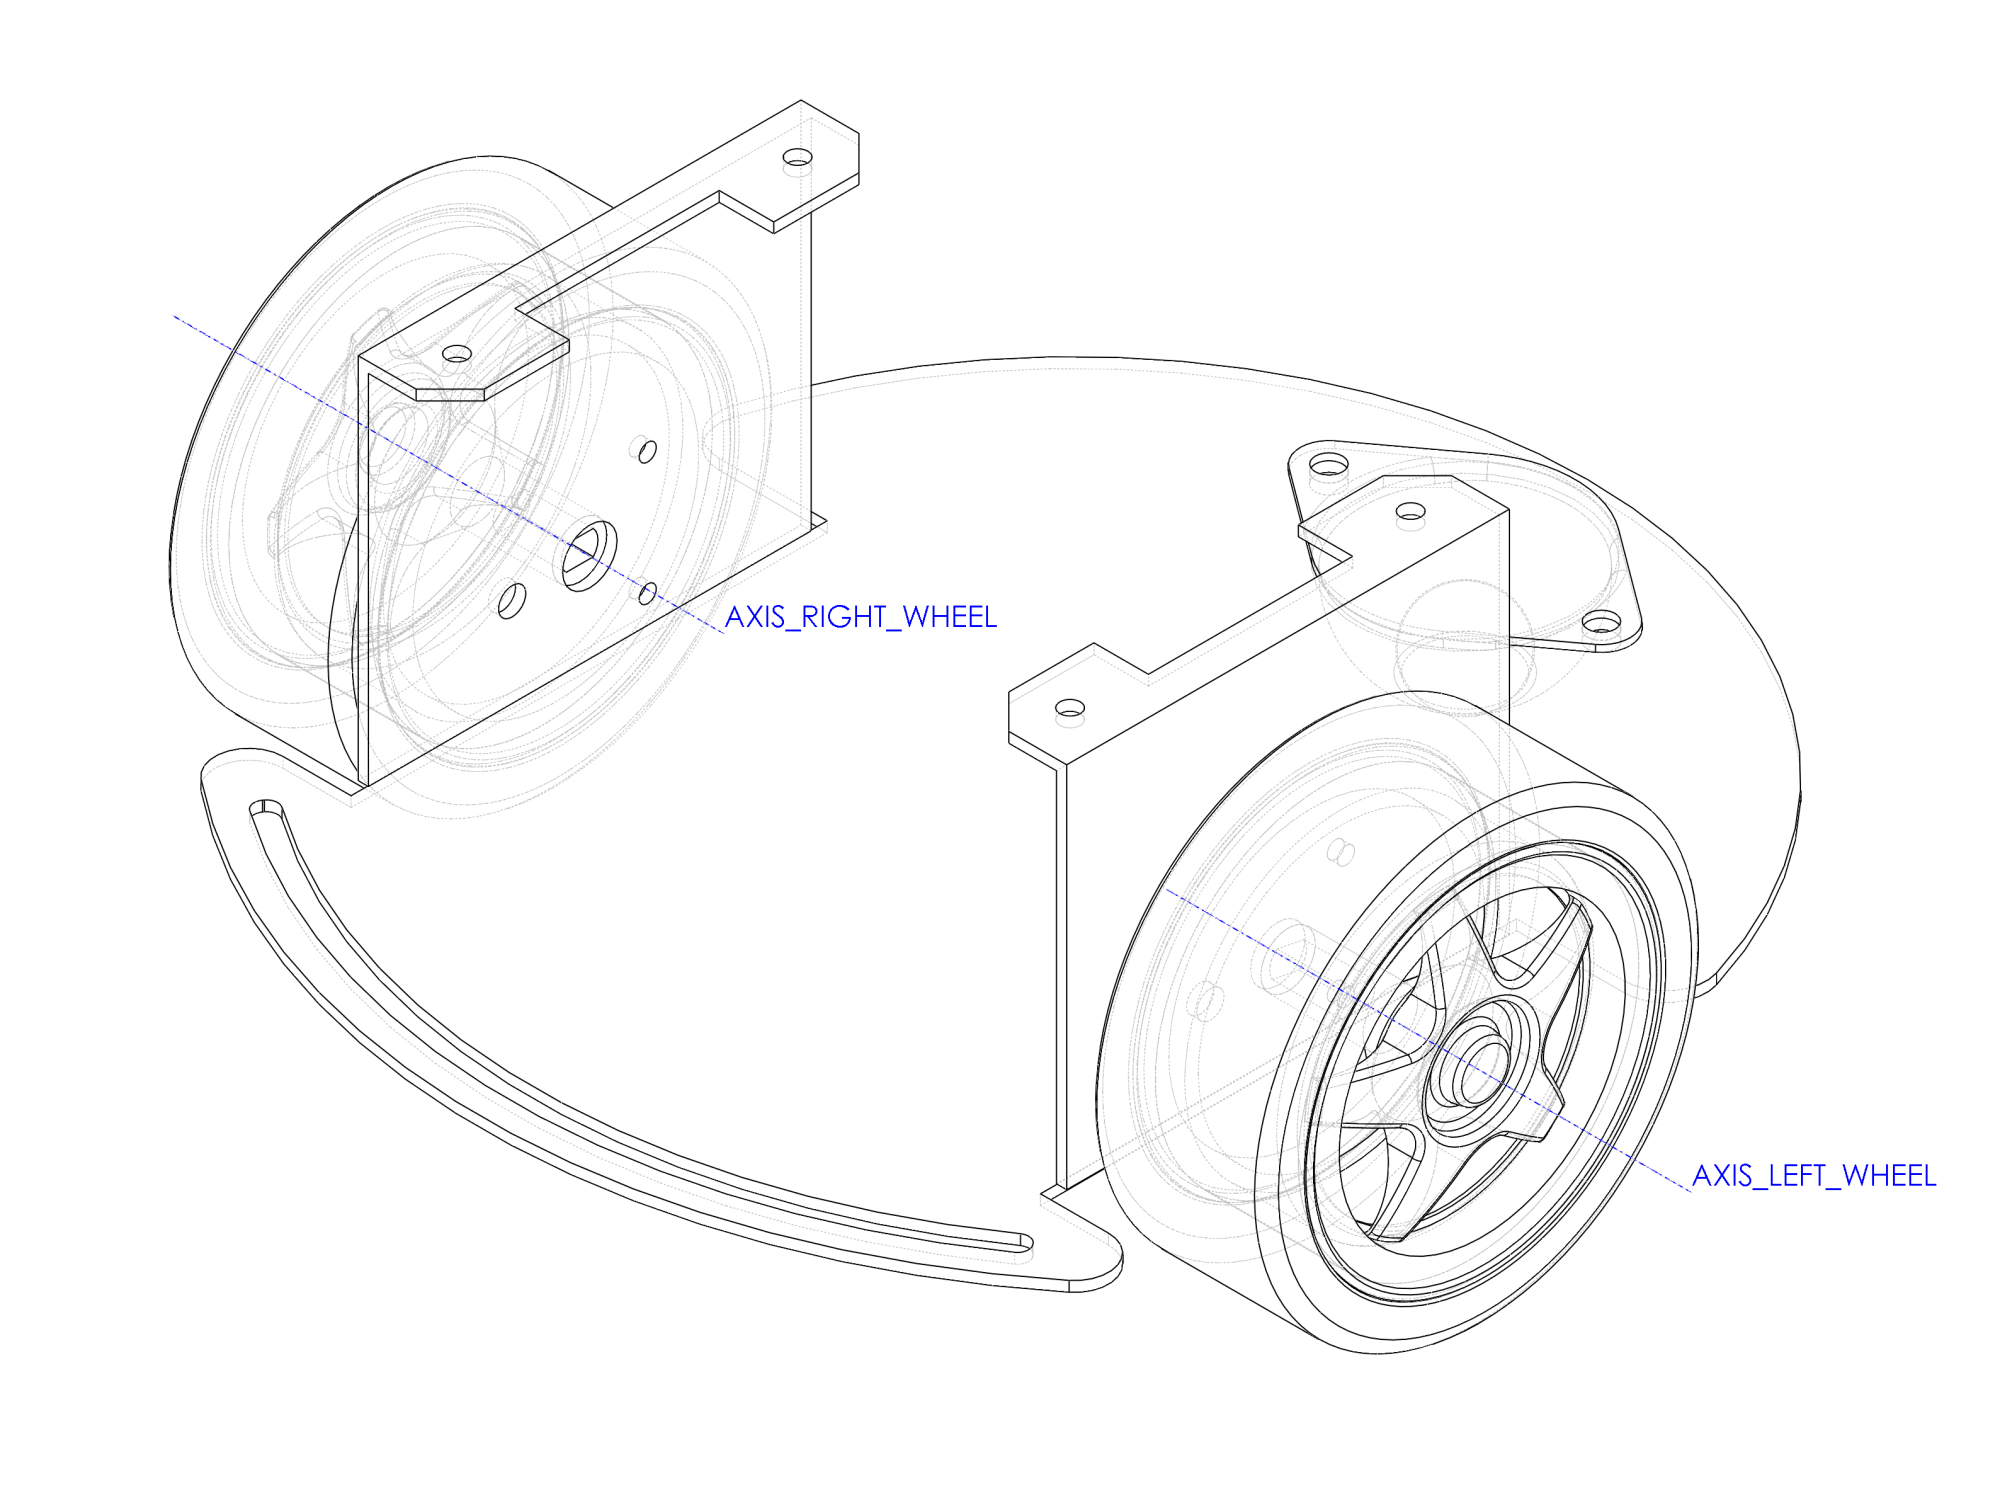 part_6_cad_drawing_3